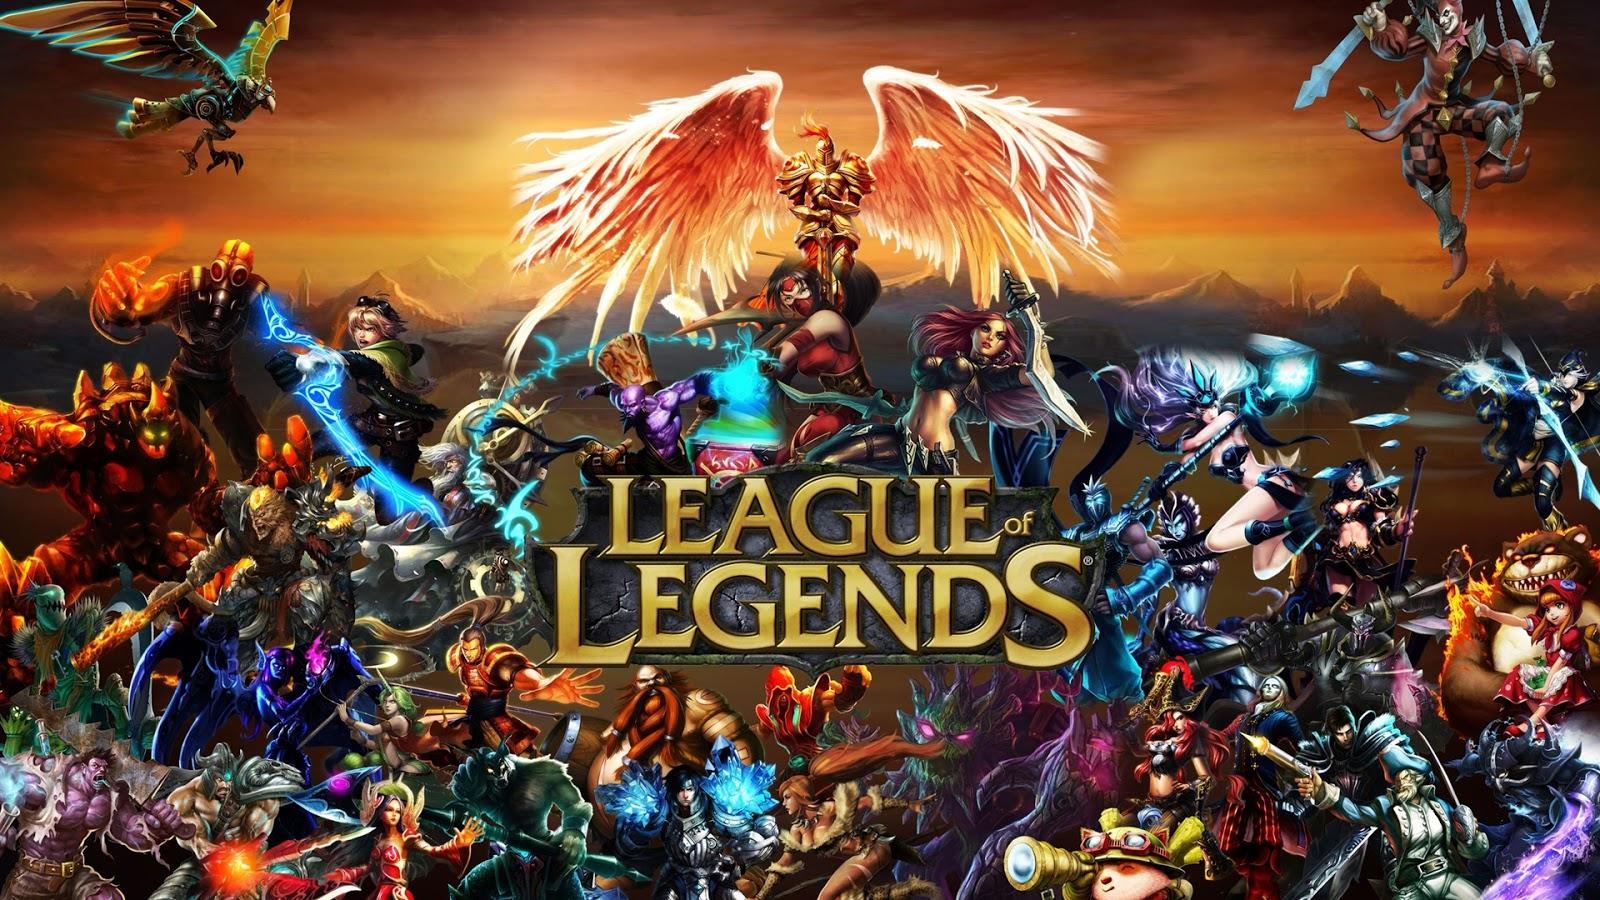 league of legends wallpapers hd 1080p 1600x900